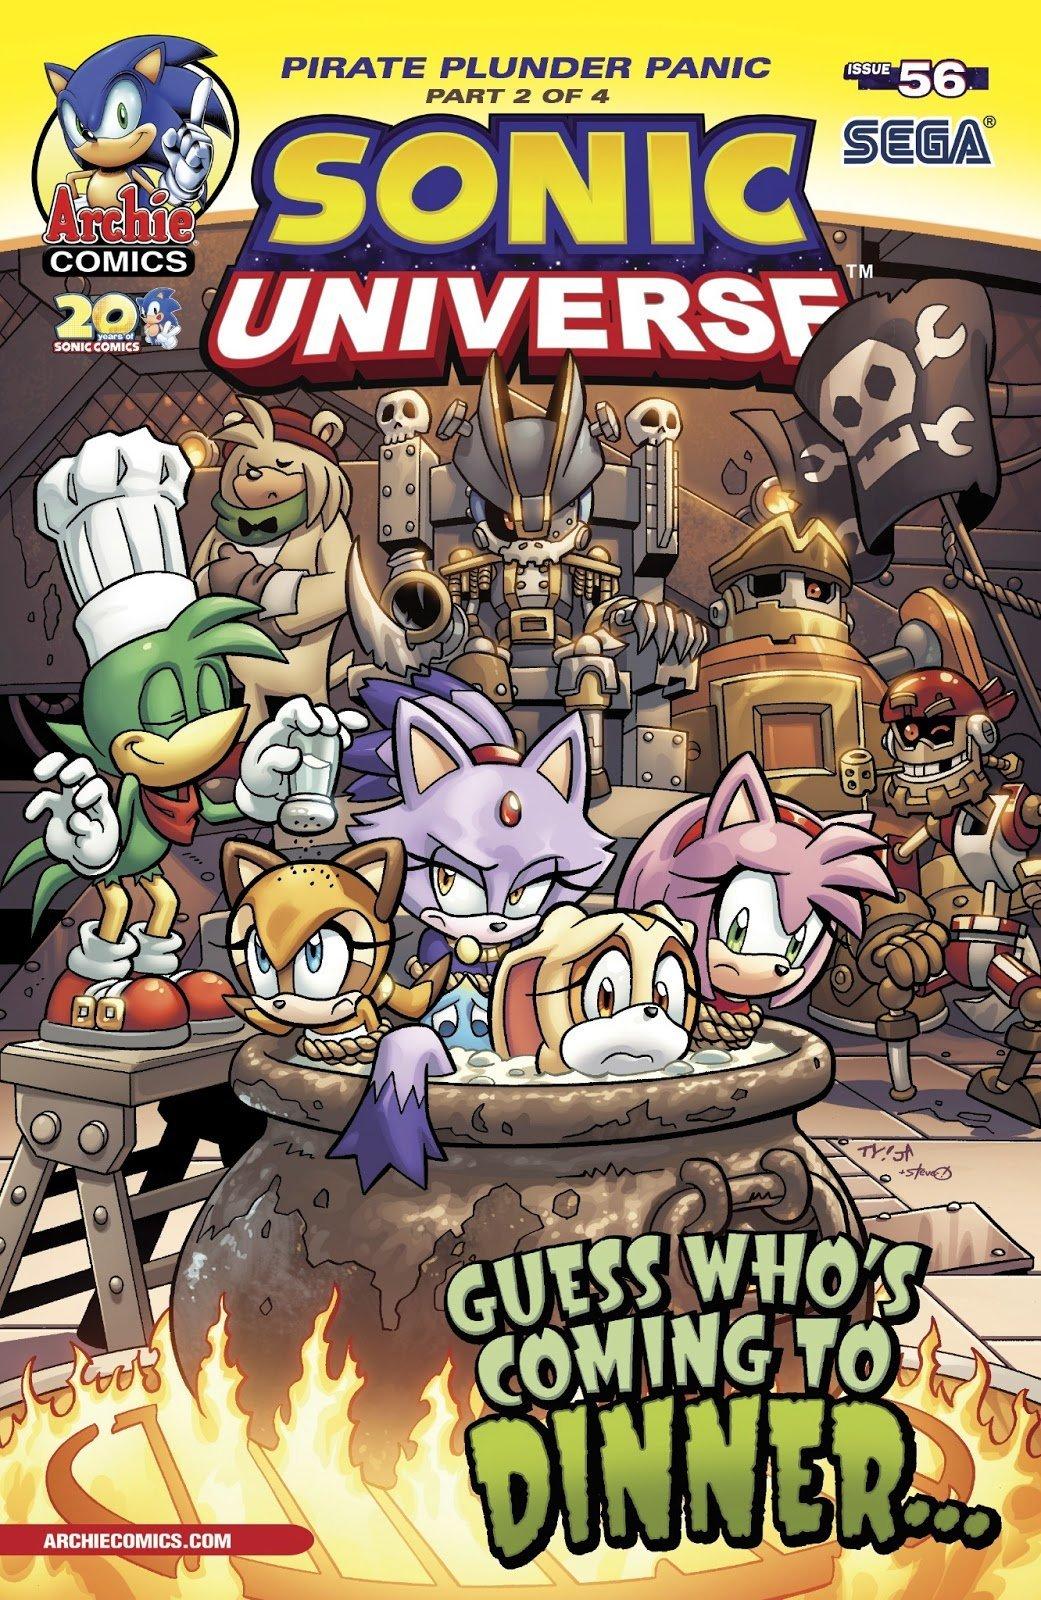 Sonic Universe 056 (November 2013)